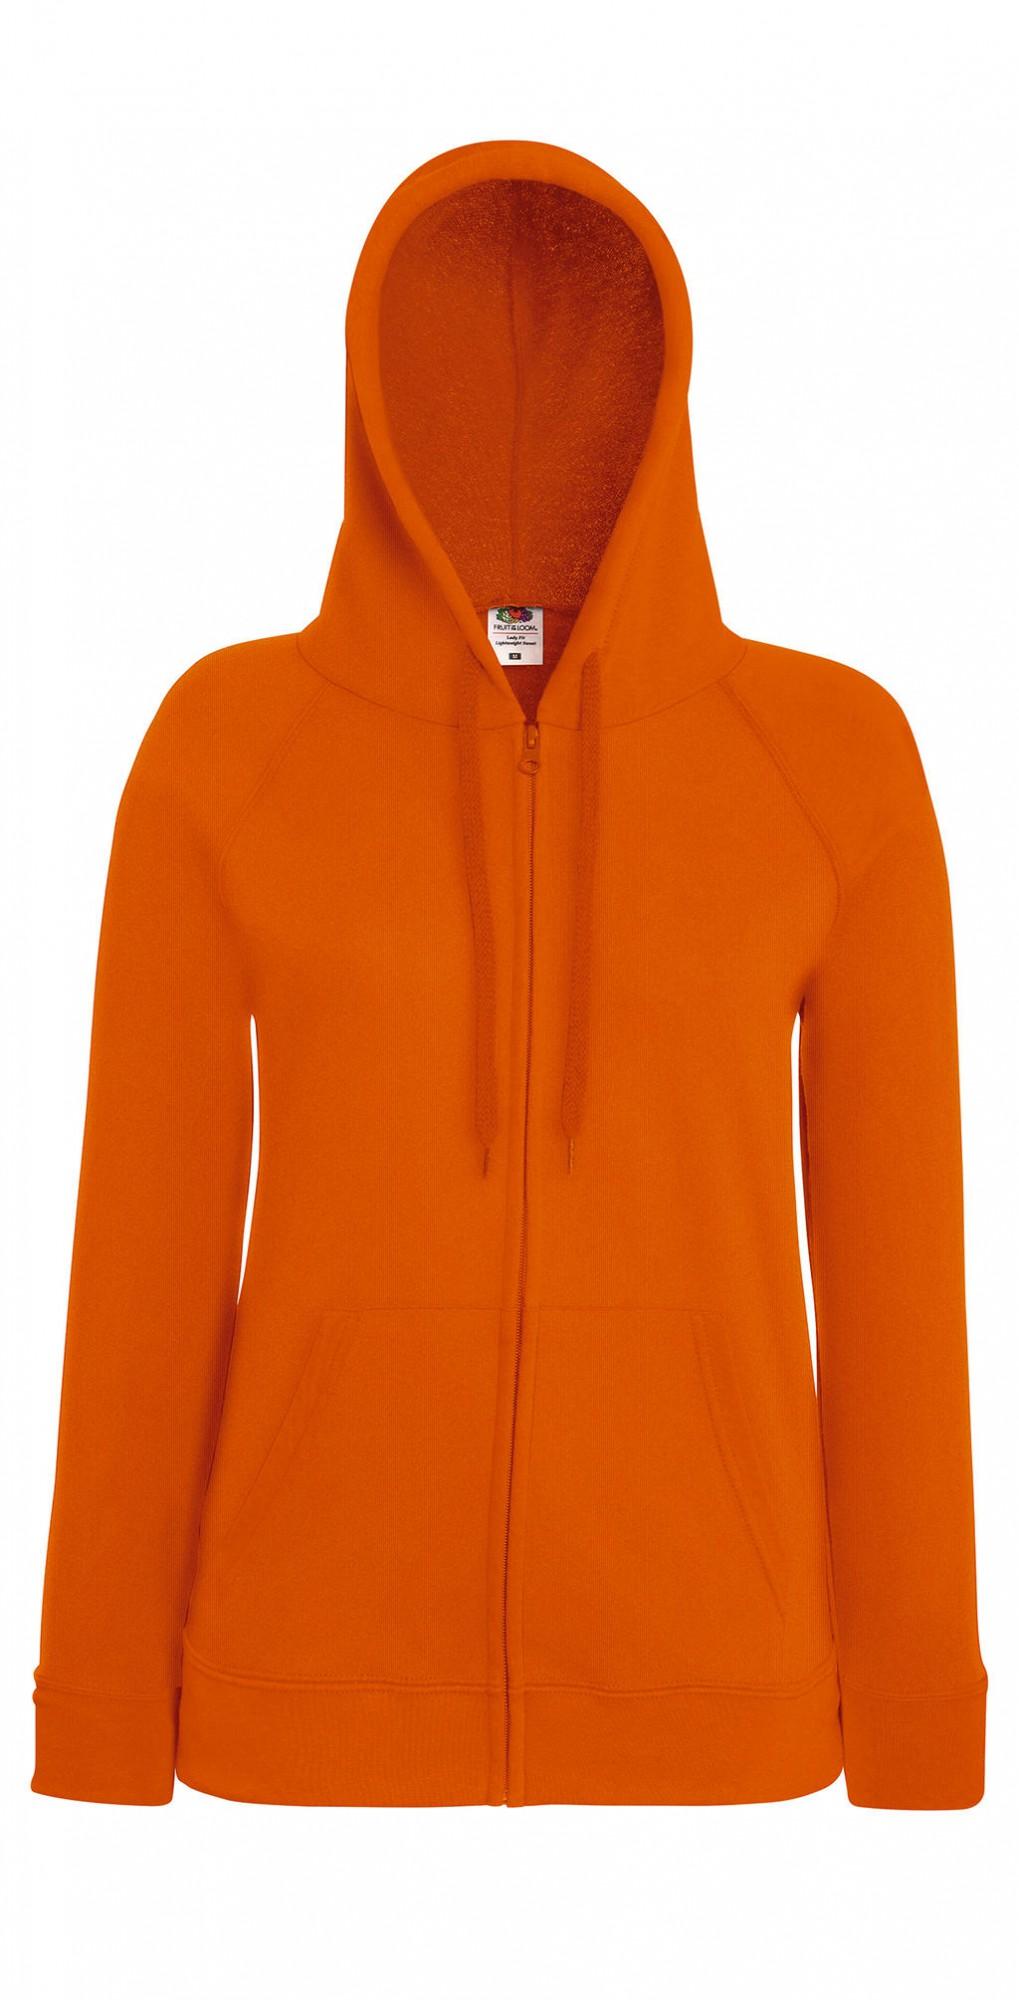 Lady Fit Lightweight Hooded Sweat Jacket